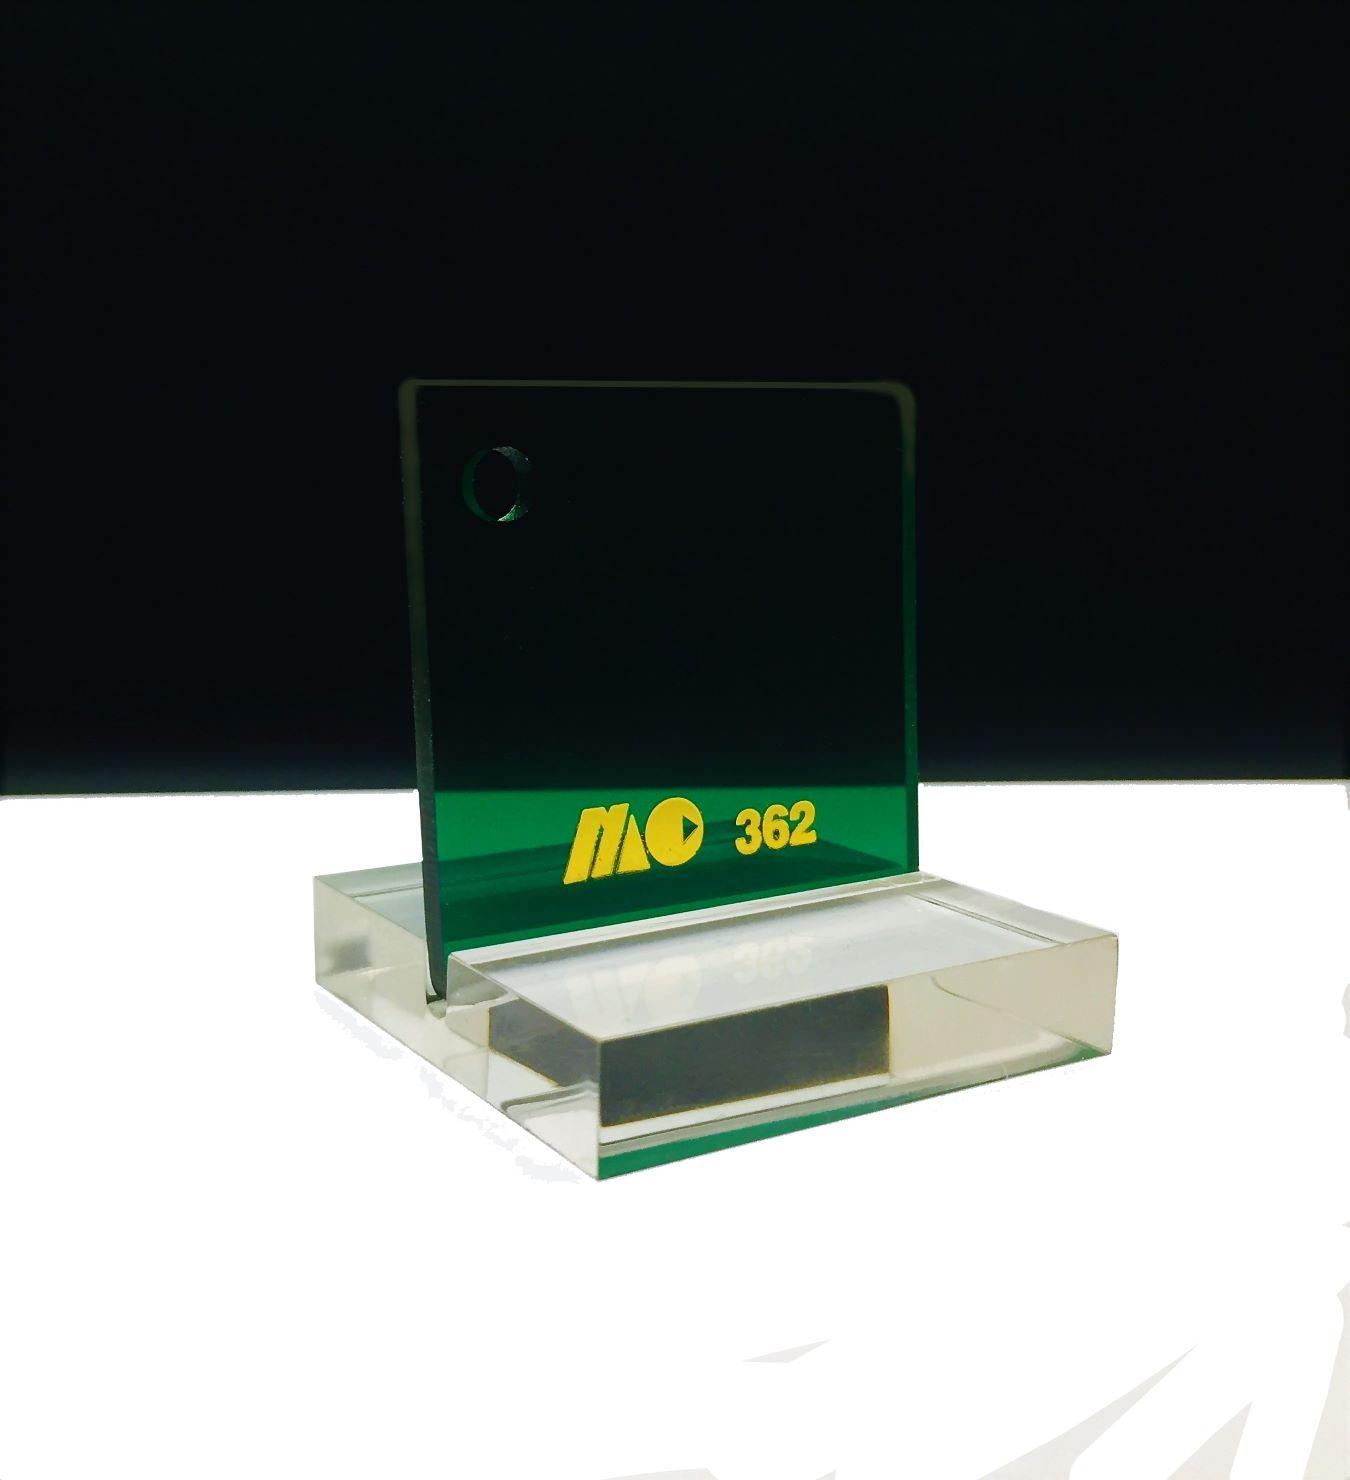 MC 362